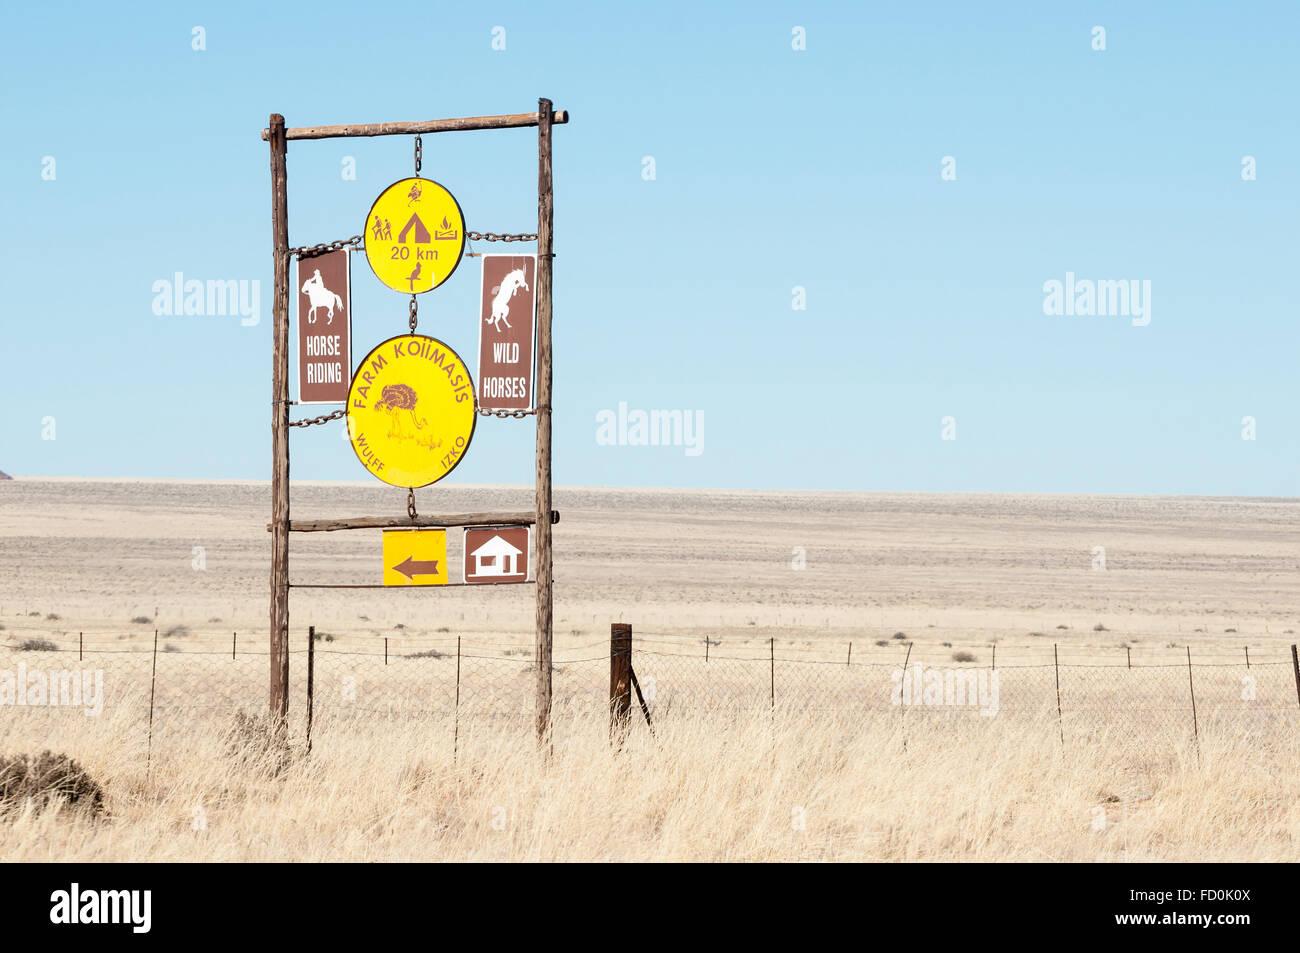 KOIIMASIS, NAMIBIA - JUNE 24, 2012: Sign post in the barren semi-desert area bordering the D707 road between Sesriem - Stock Image